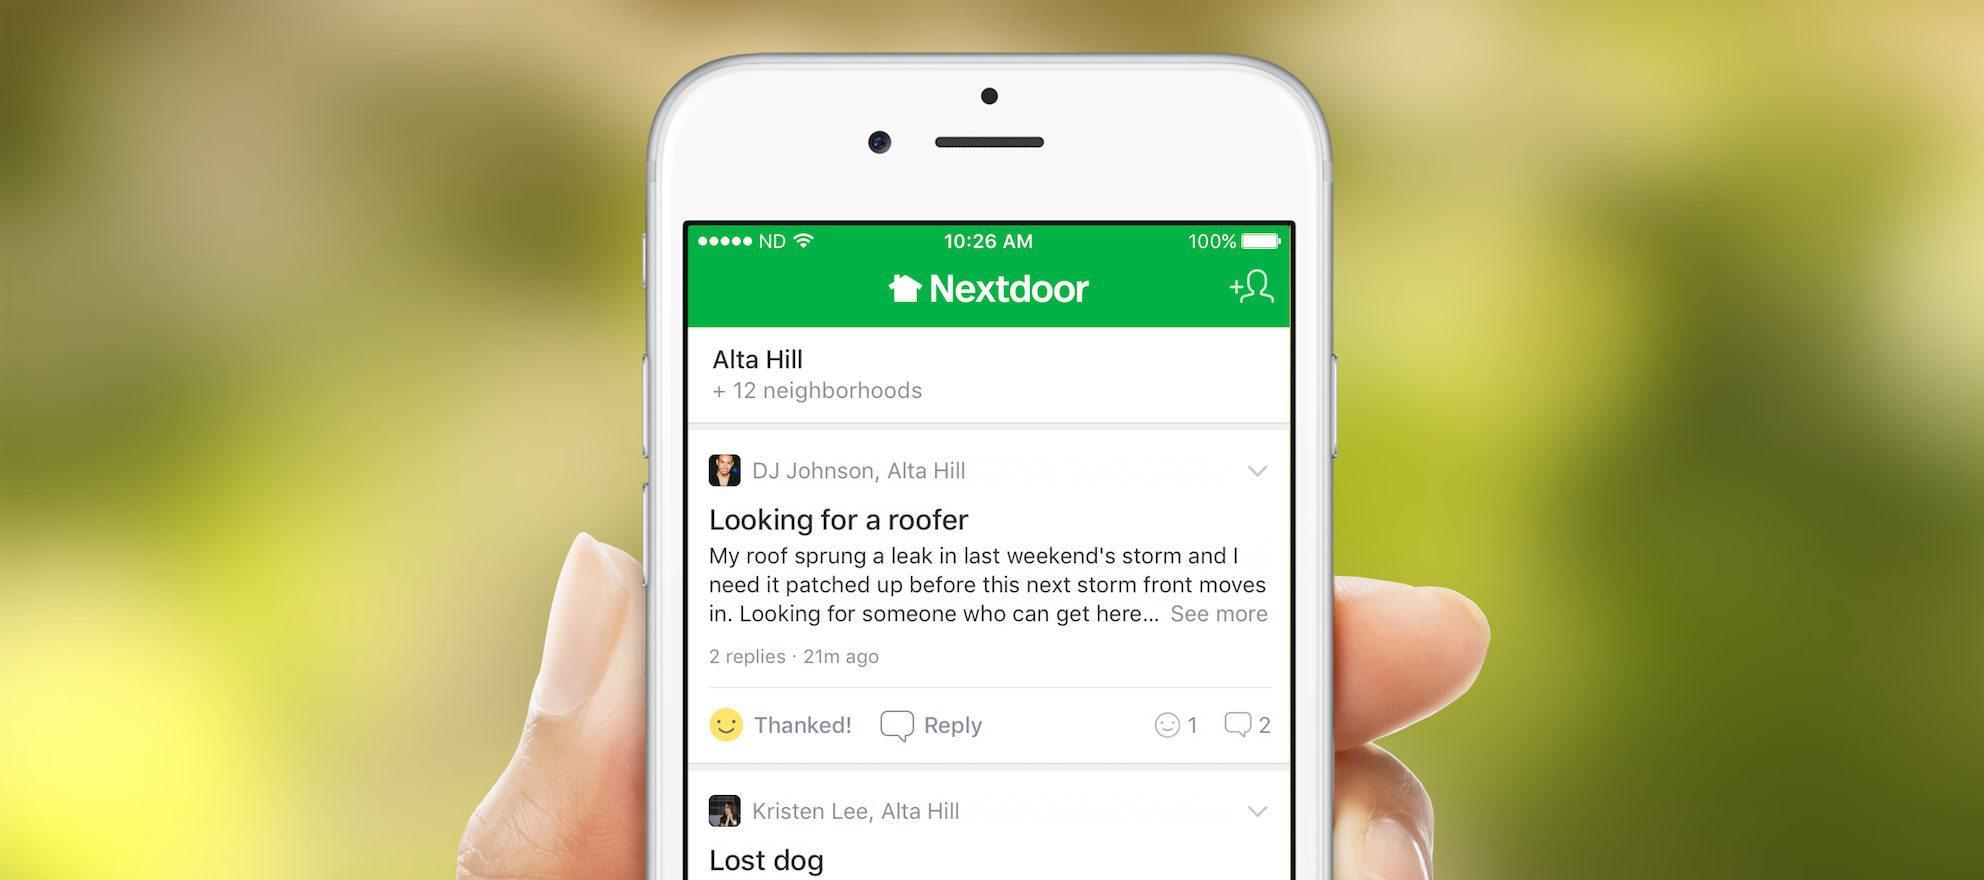 Nextdoor raises $123M in funding